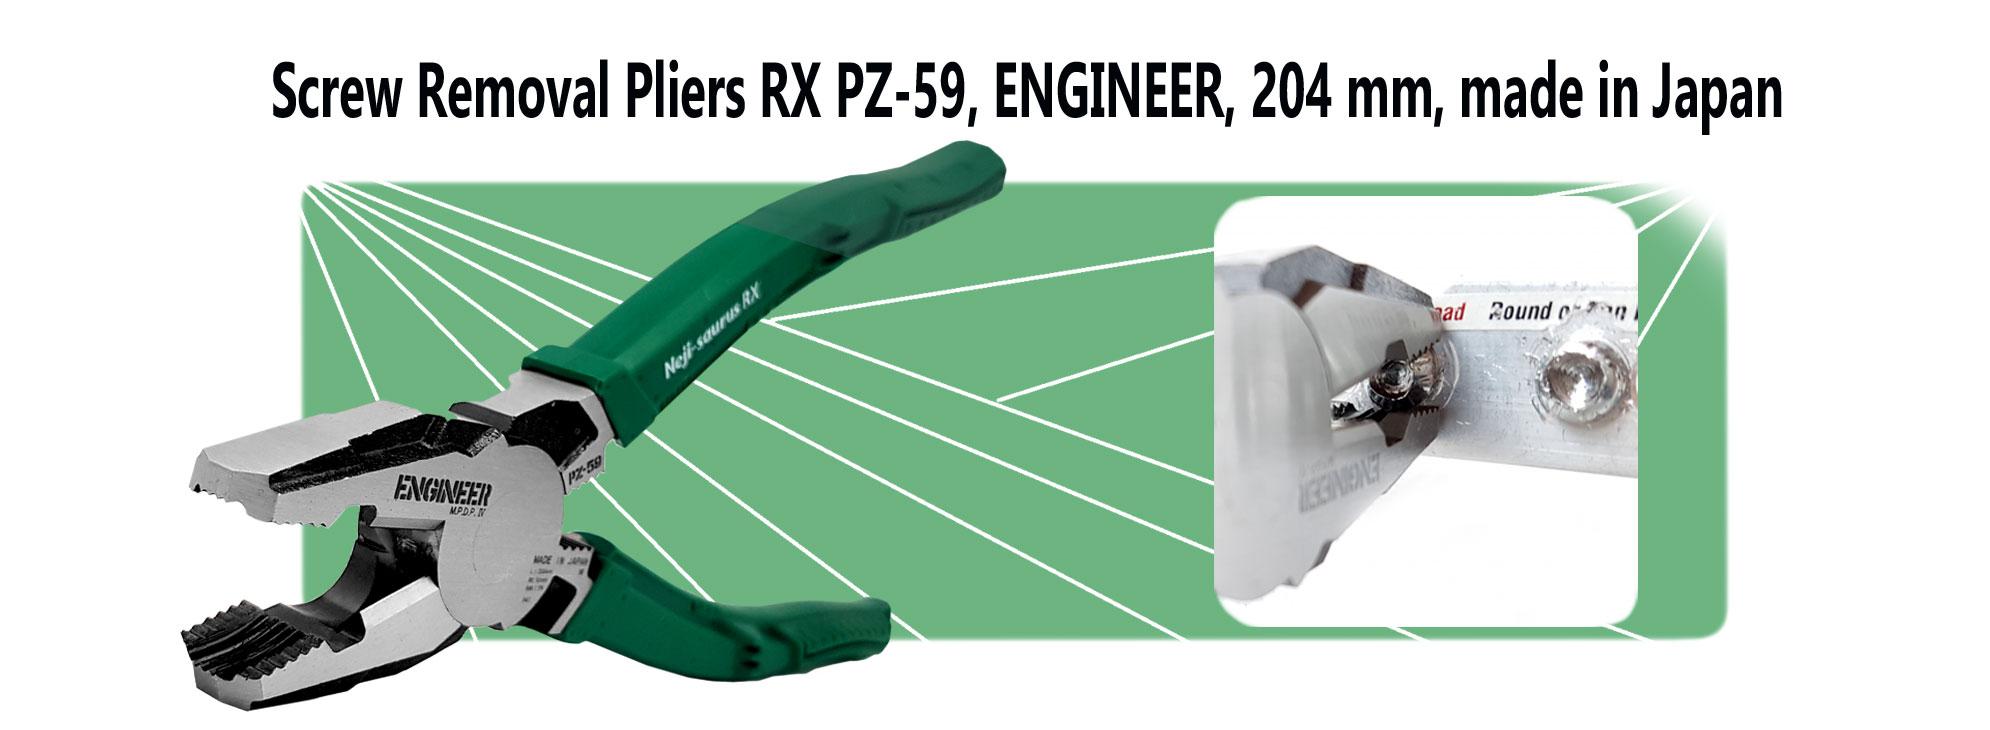 Cleste-patent-combinat-extragere-suruburi-rupte-ENGINEER-PZ-59-EN